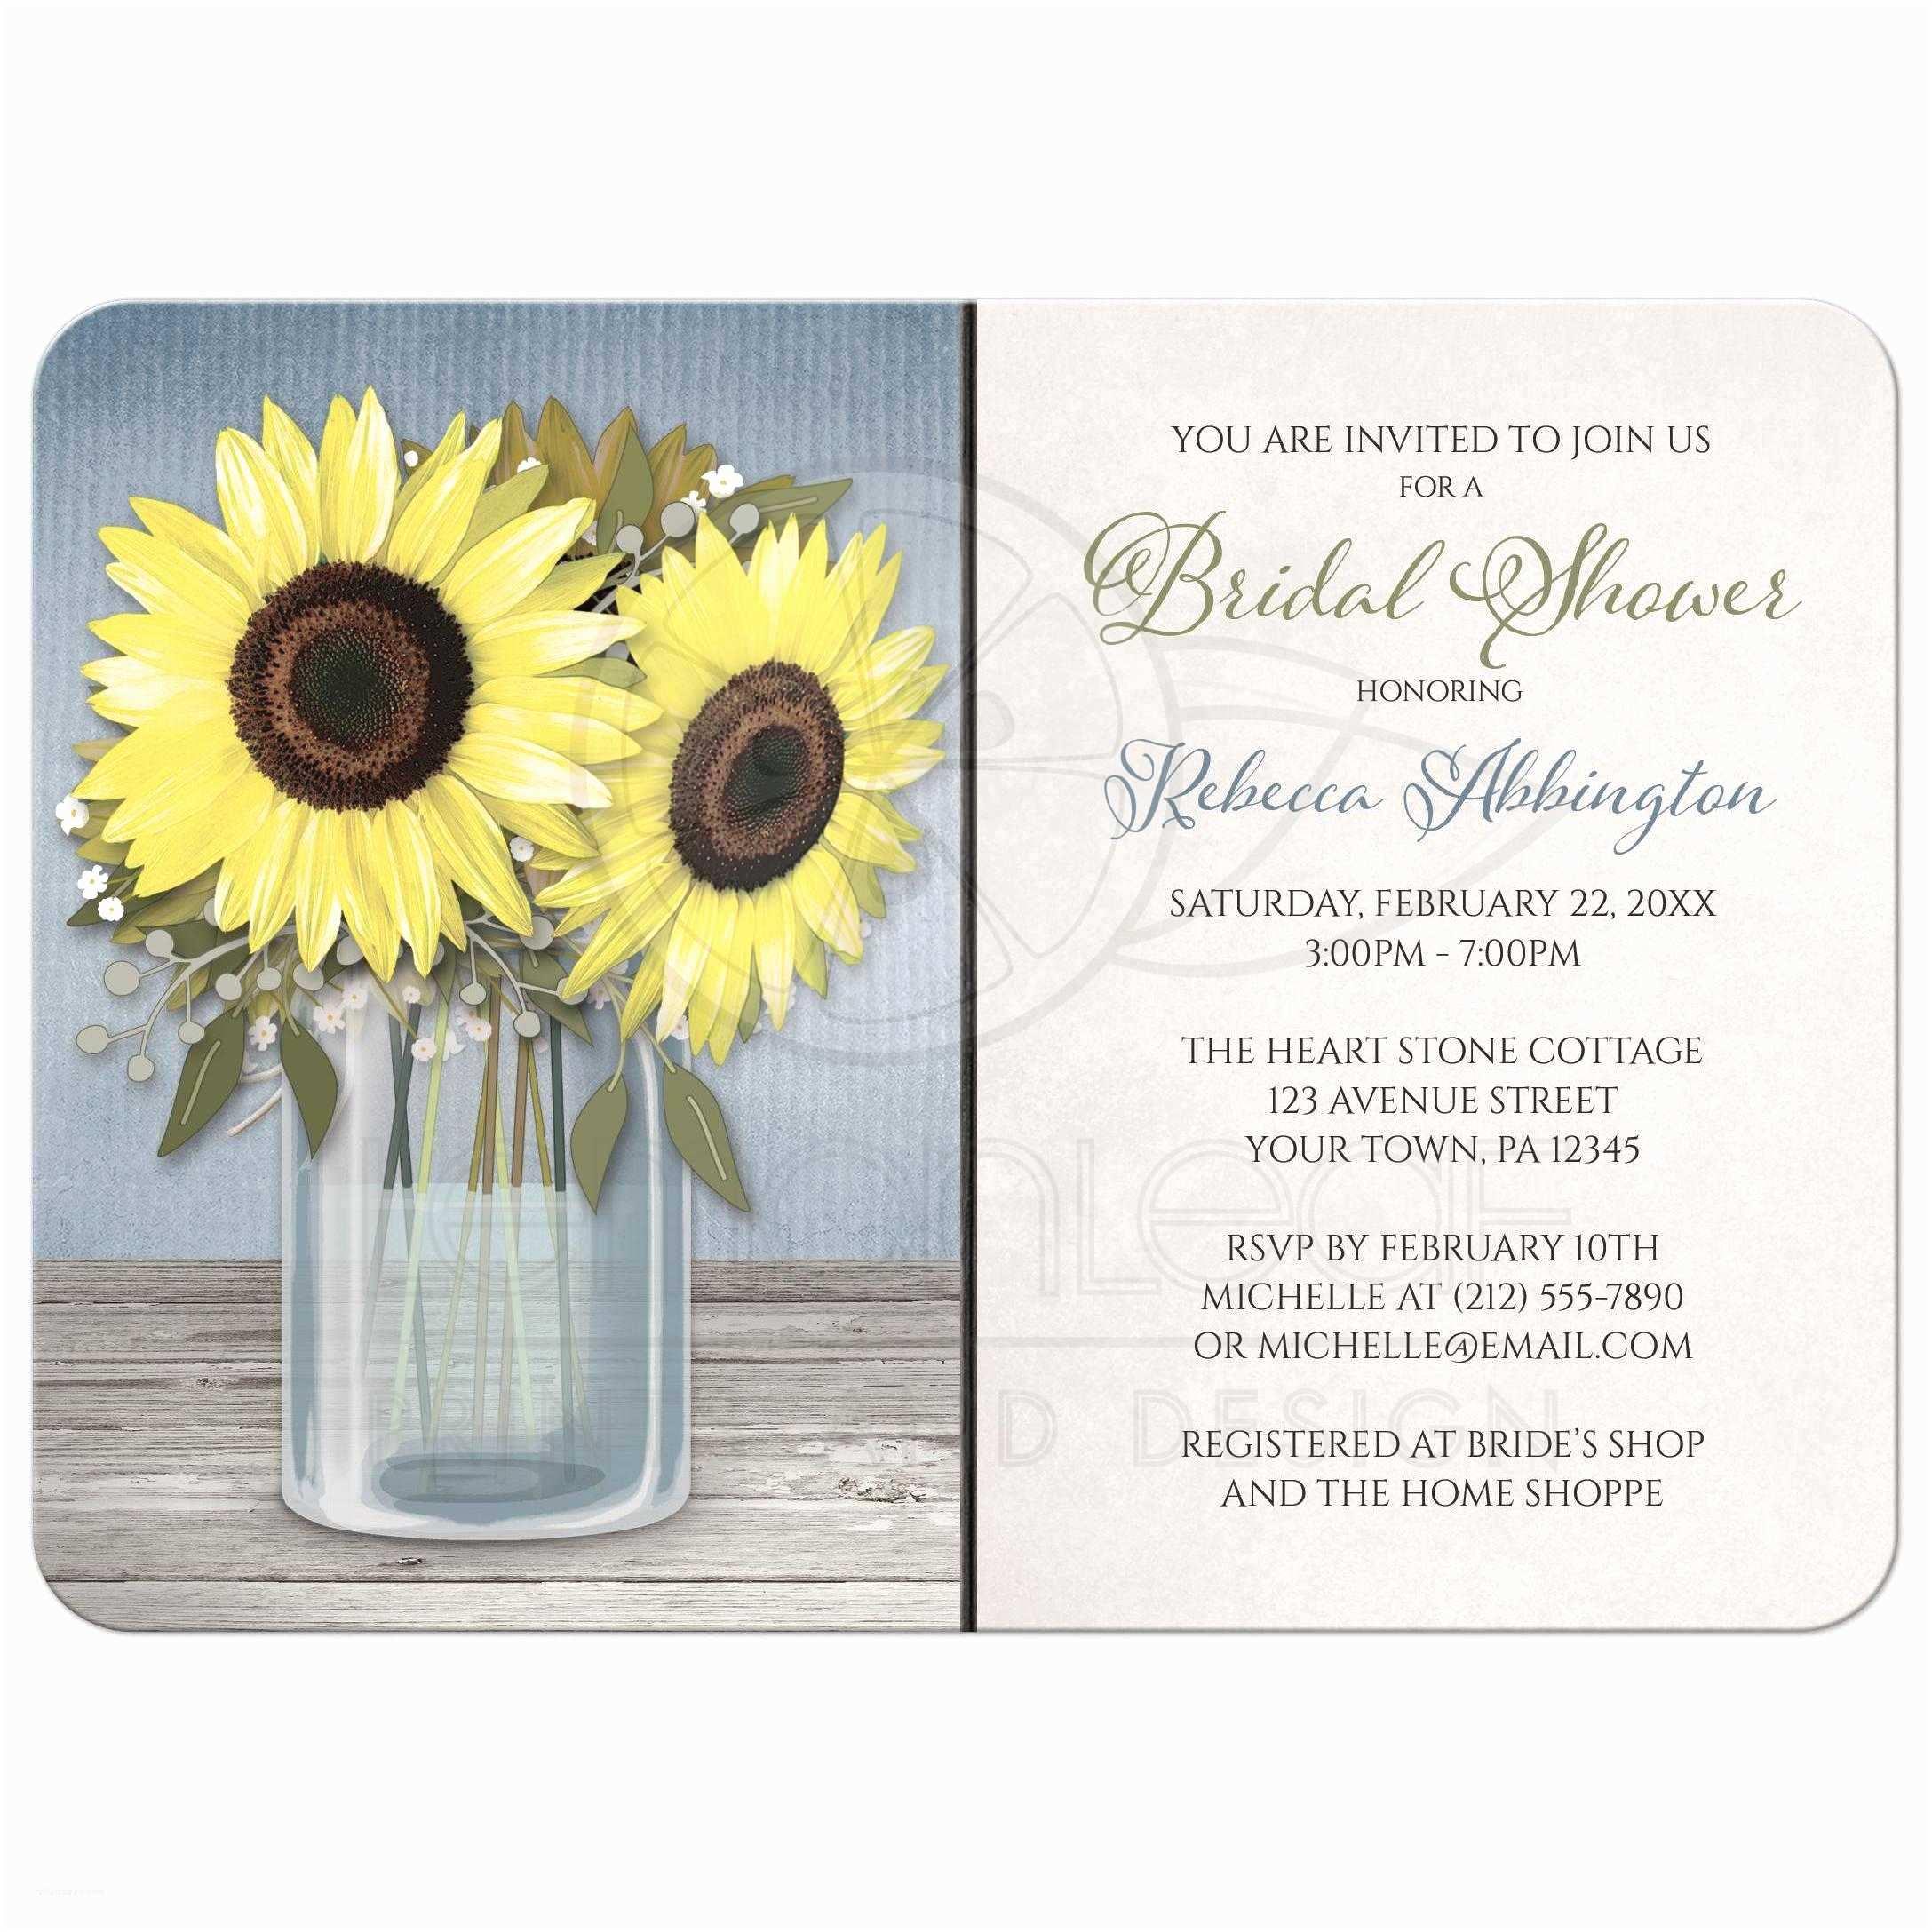 Mason Jar Bridal Shower Invitations Bridal Shower Invitations Rustic Sunflower Blue Mason Jar